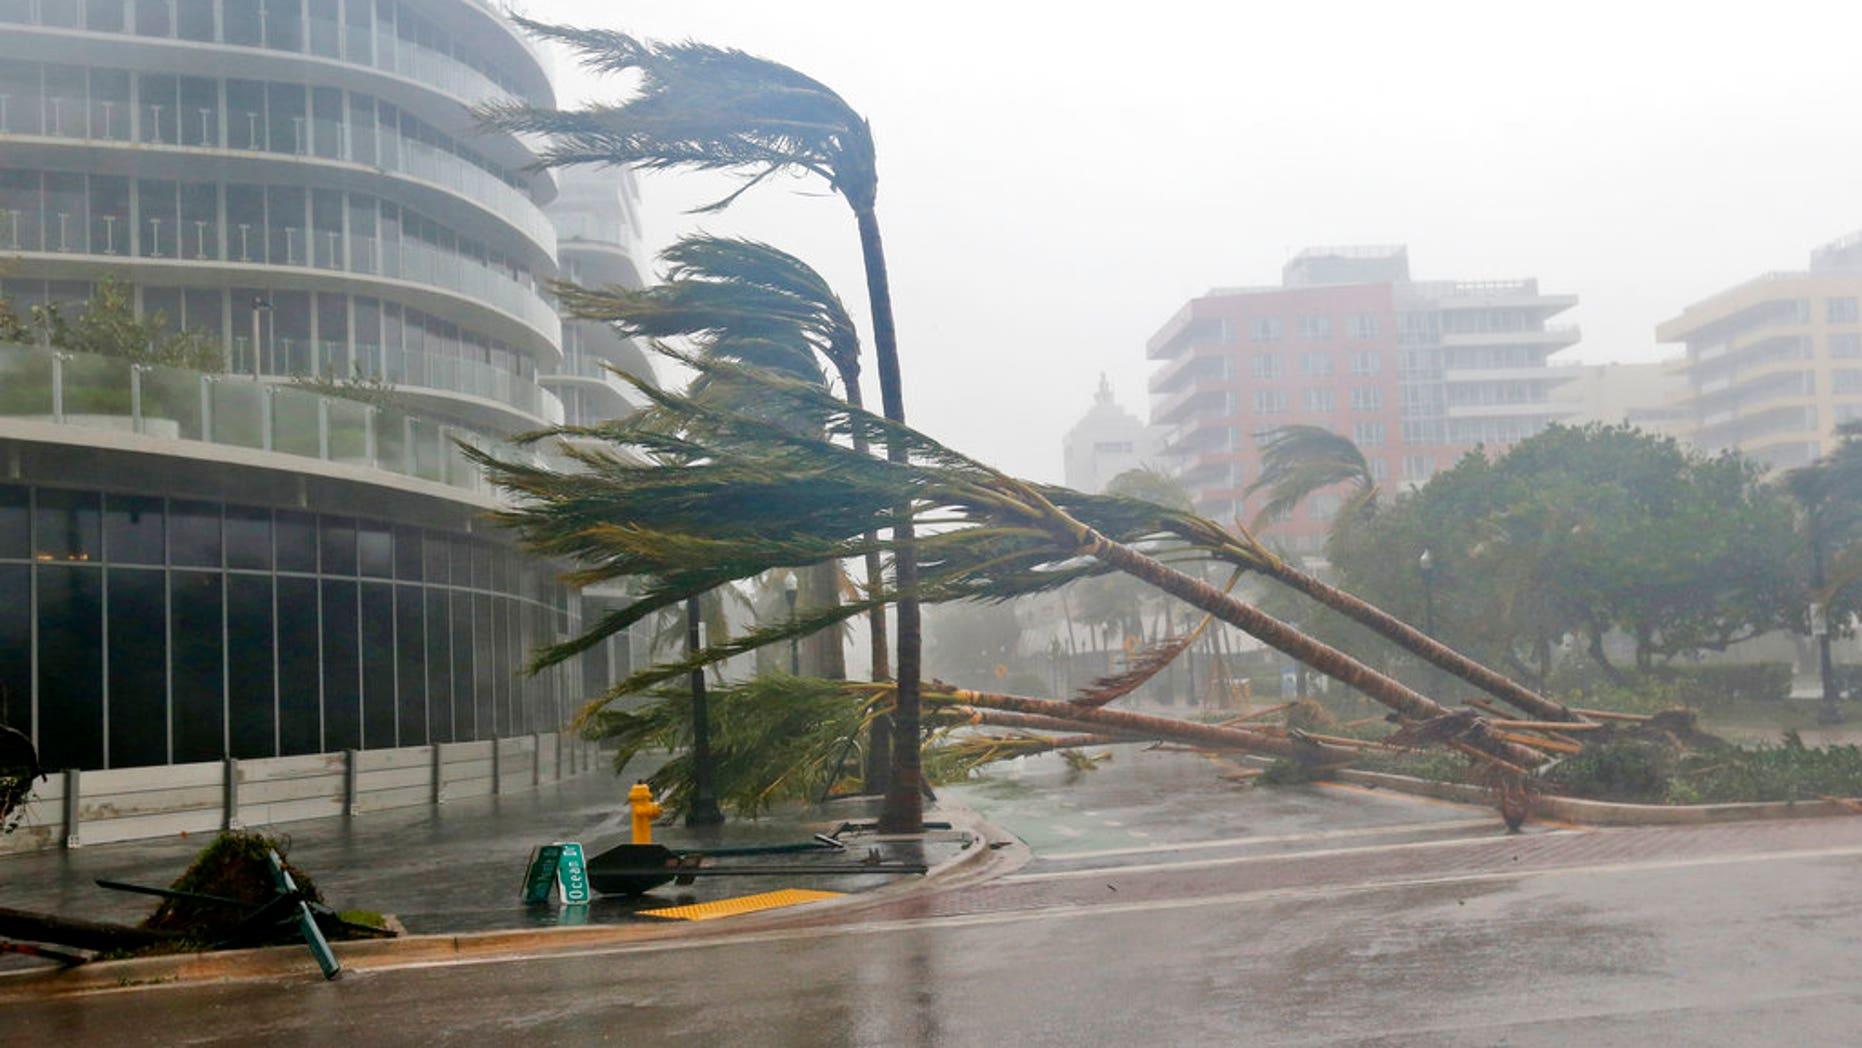 Palm trees lie strewn across the road in Miami Beach.